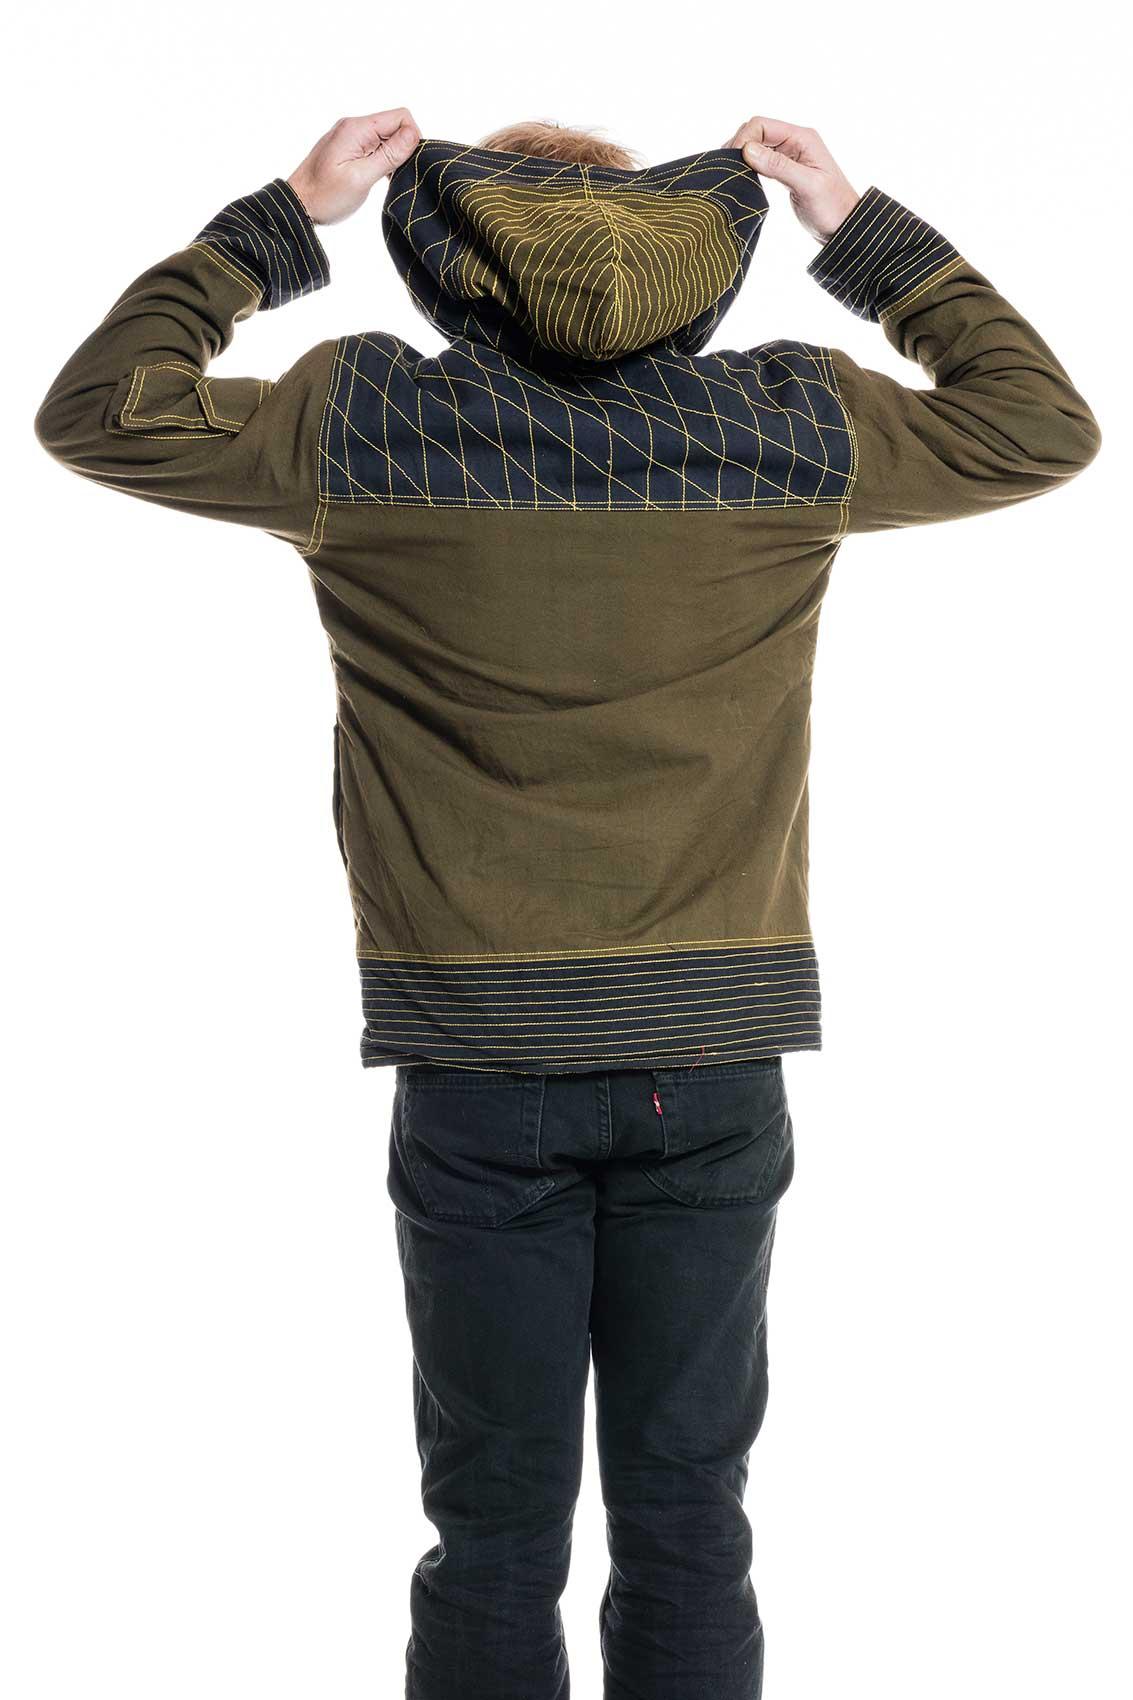 festival jacket psy trance boho army coat with hoodie altshop uk. Black Bedroom Furniture Sets. Home Design Ideas